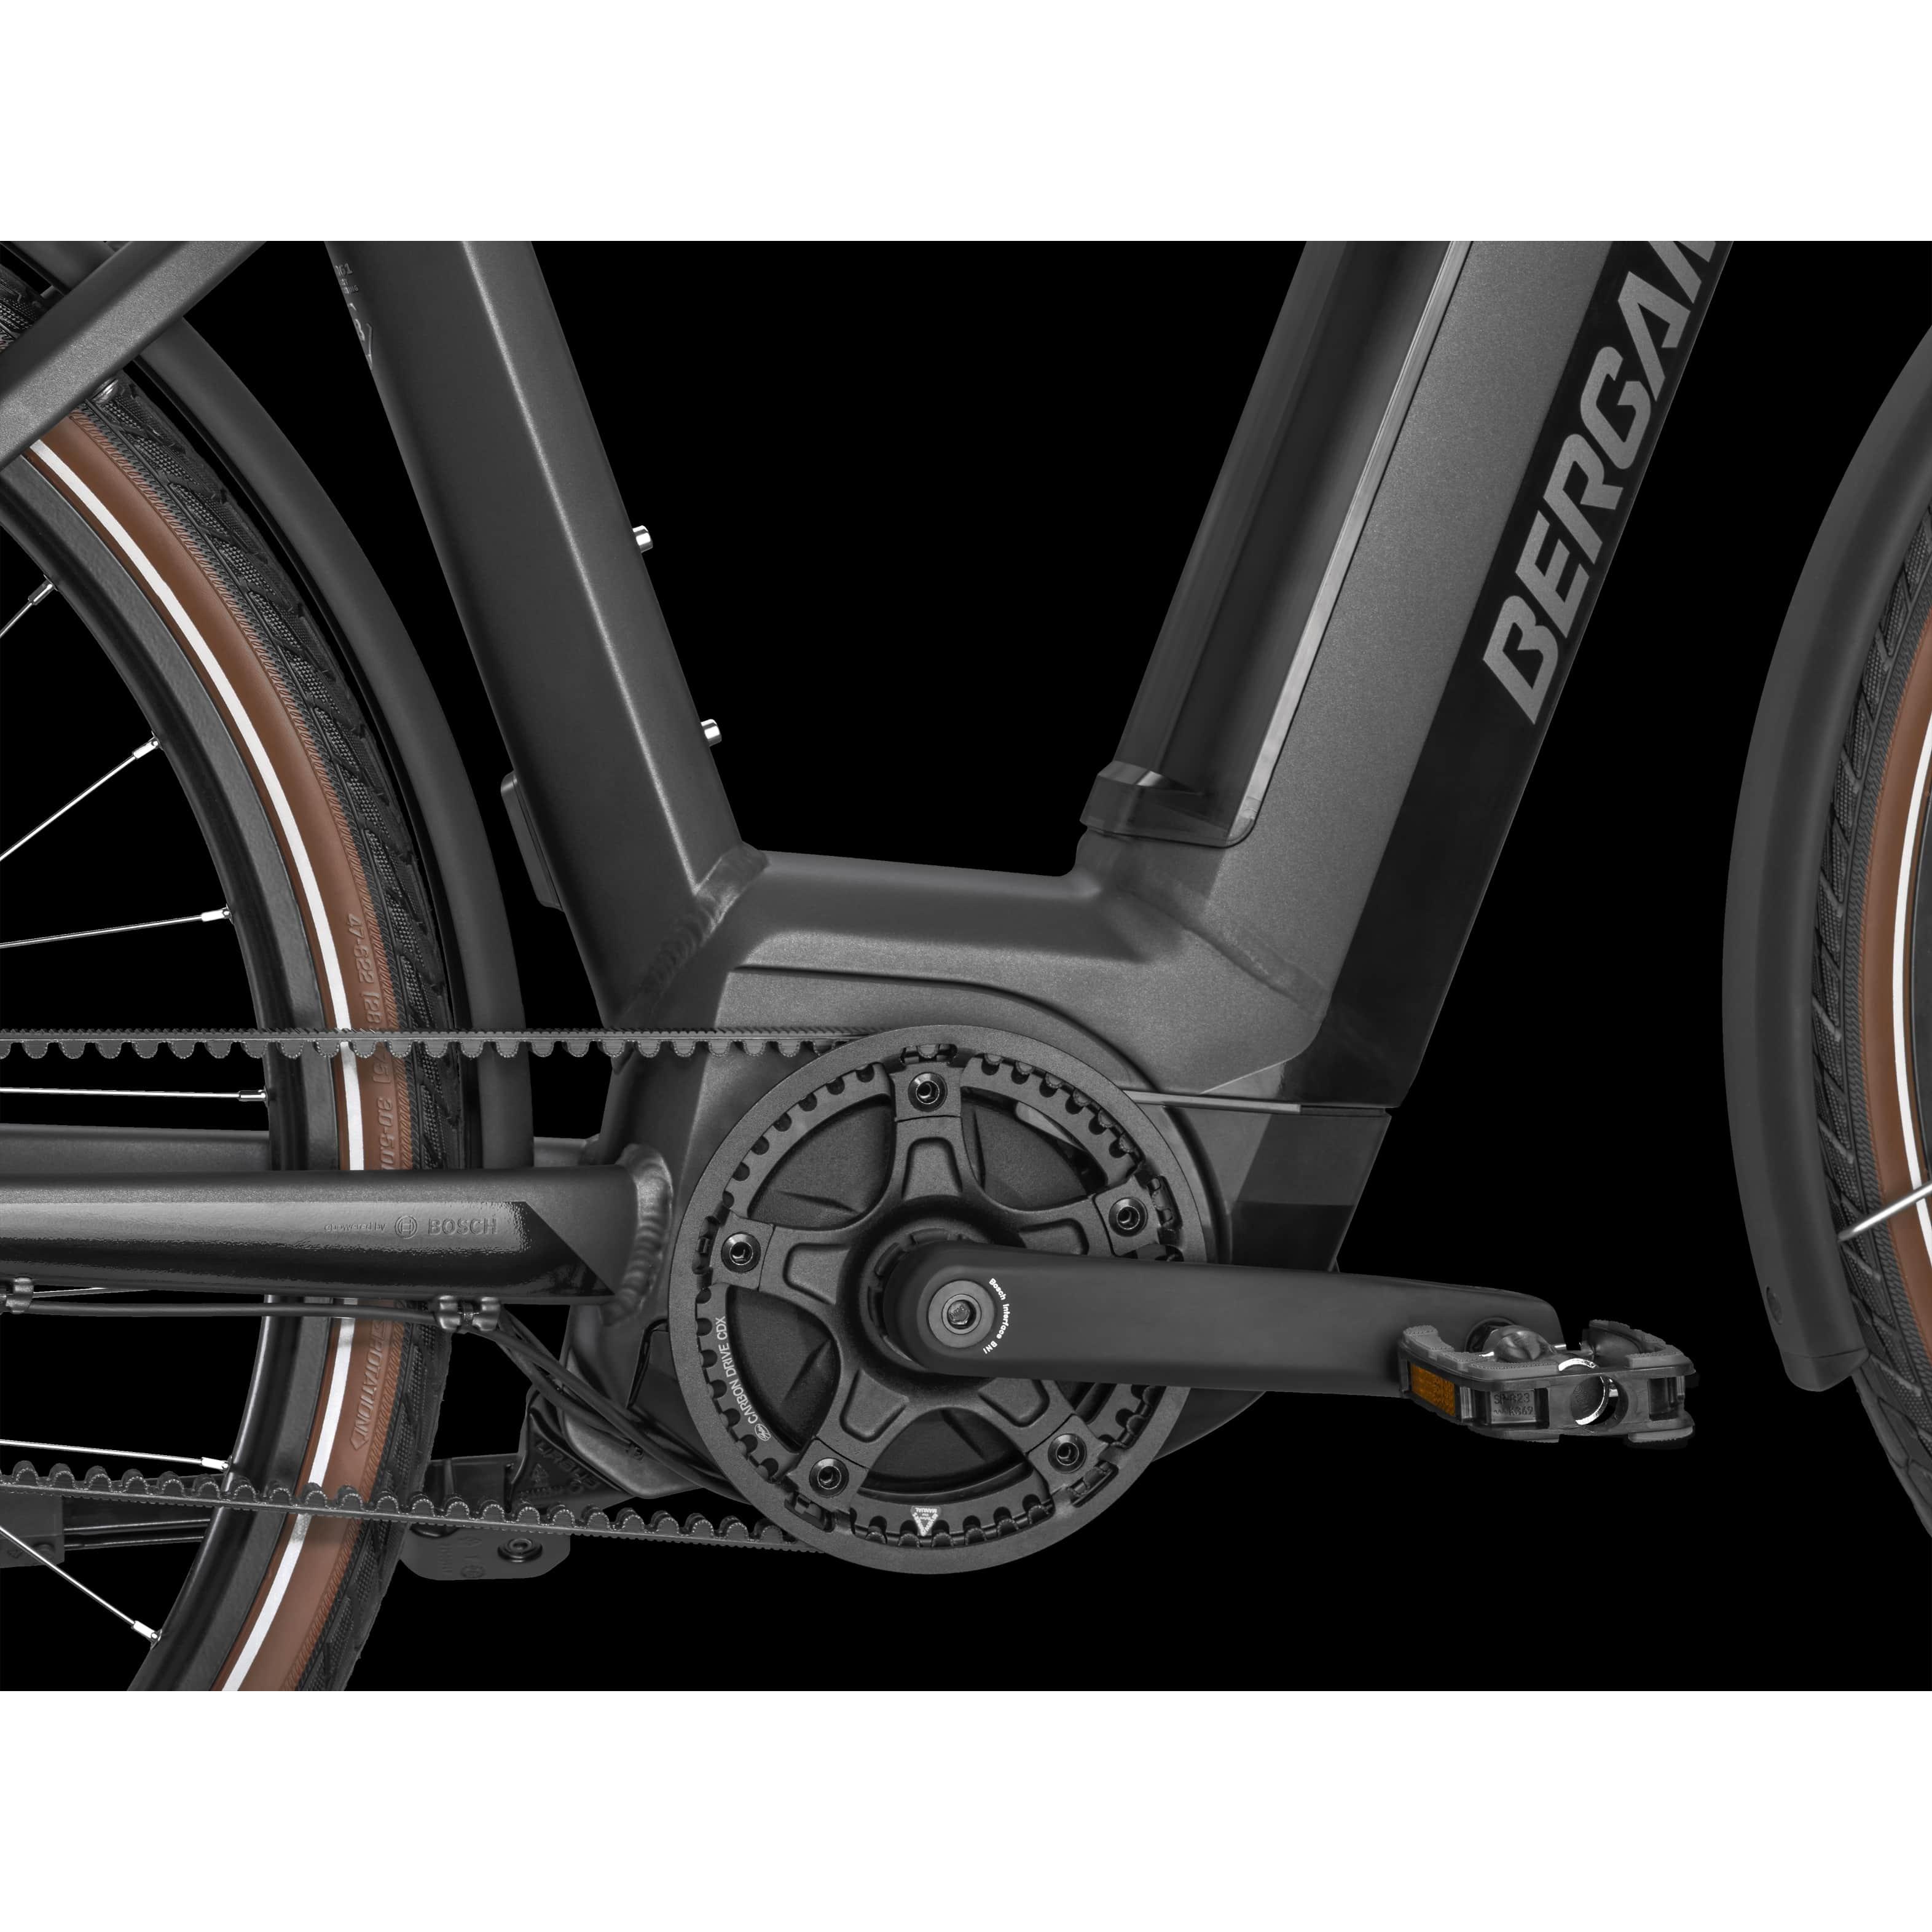 "Bergamont E-Horizon N5e FH 500 Wave Belt, S44 - 500WH, Freilauf, Anthracite, 28"", MJ2021"